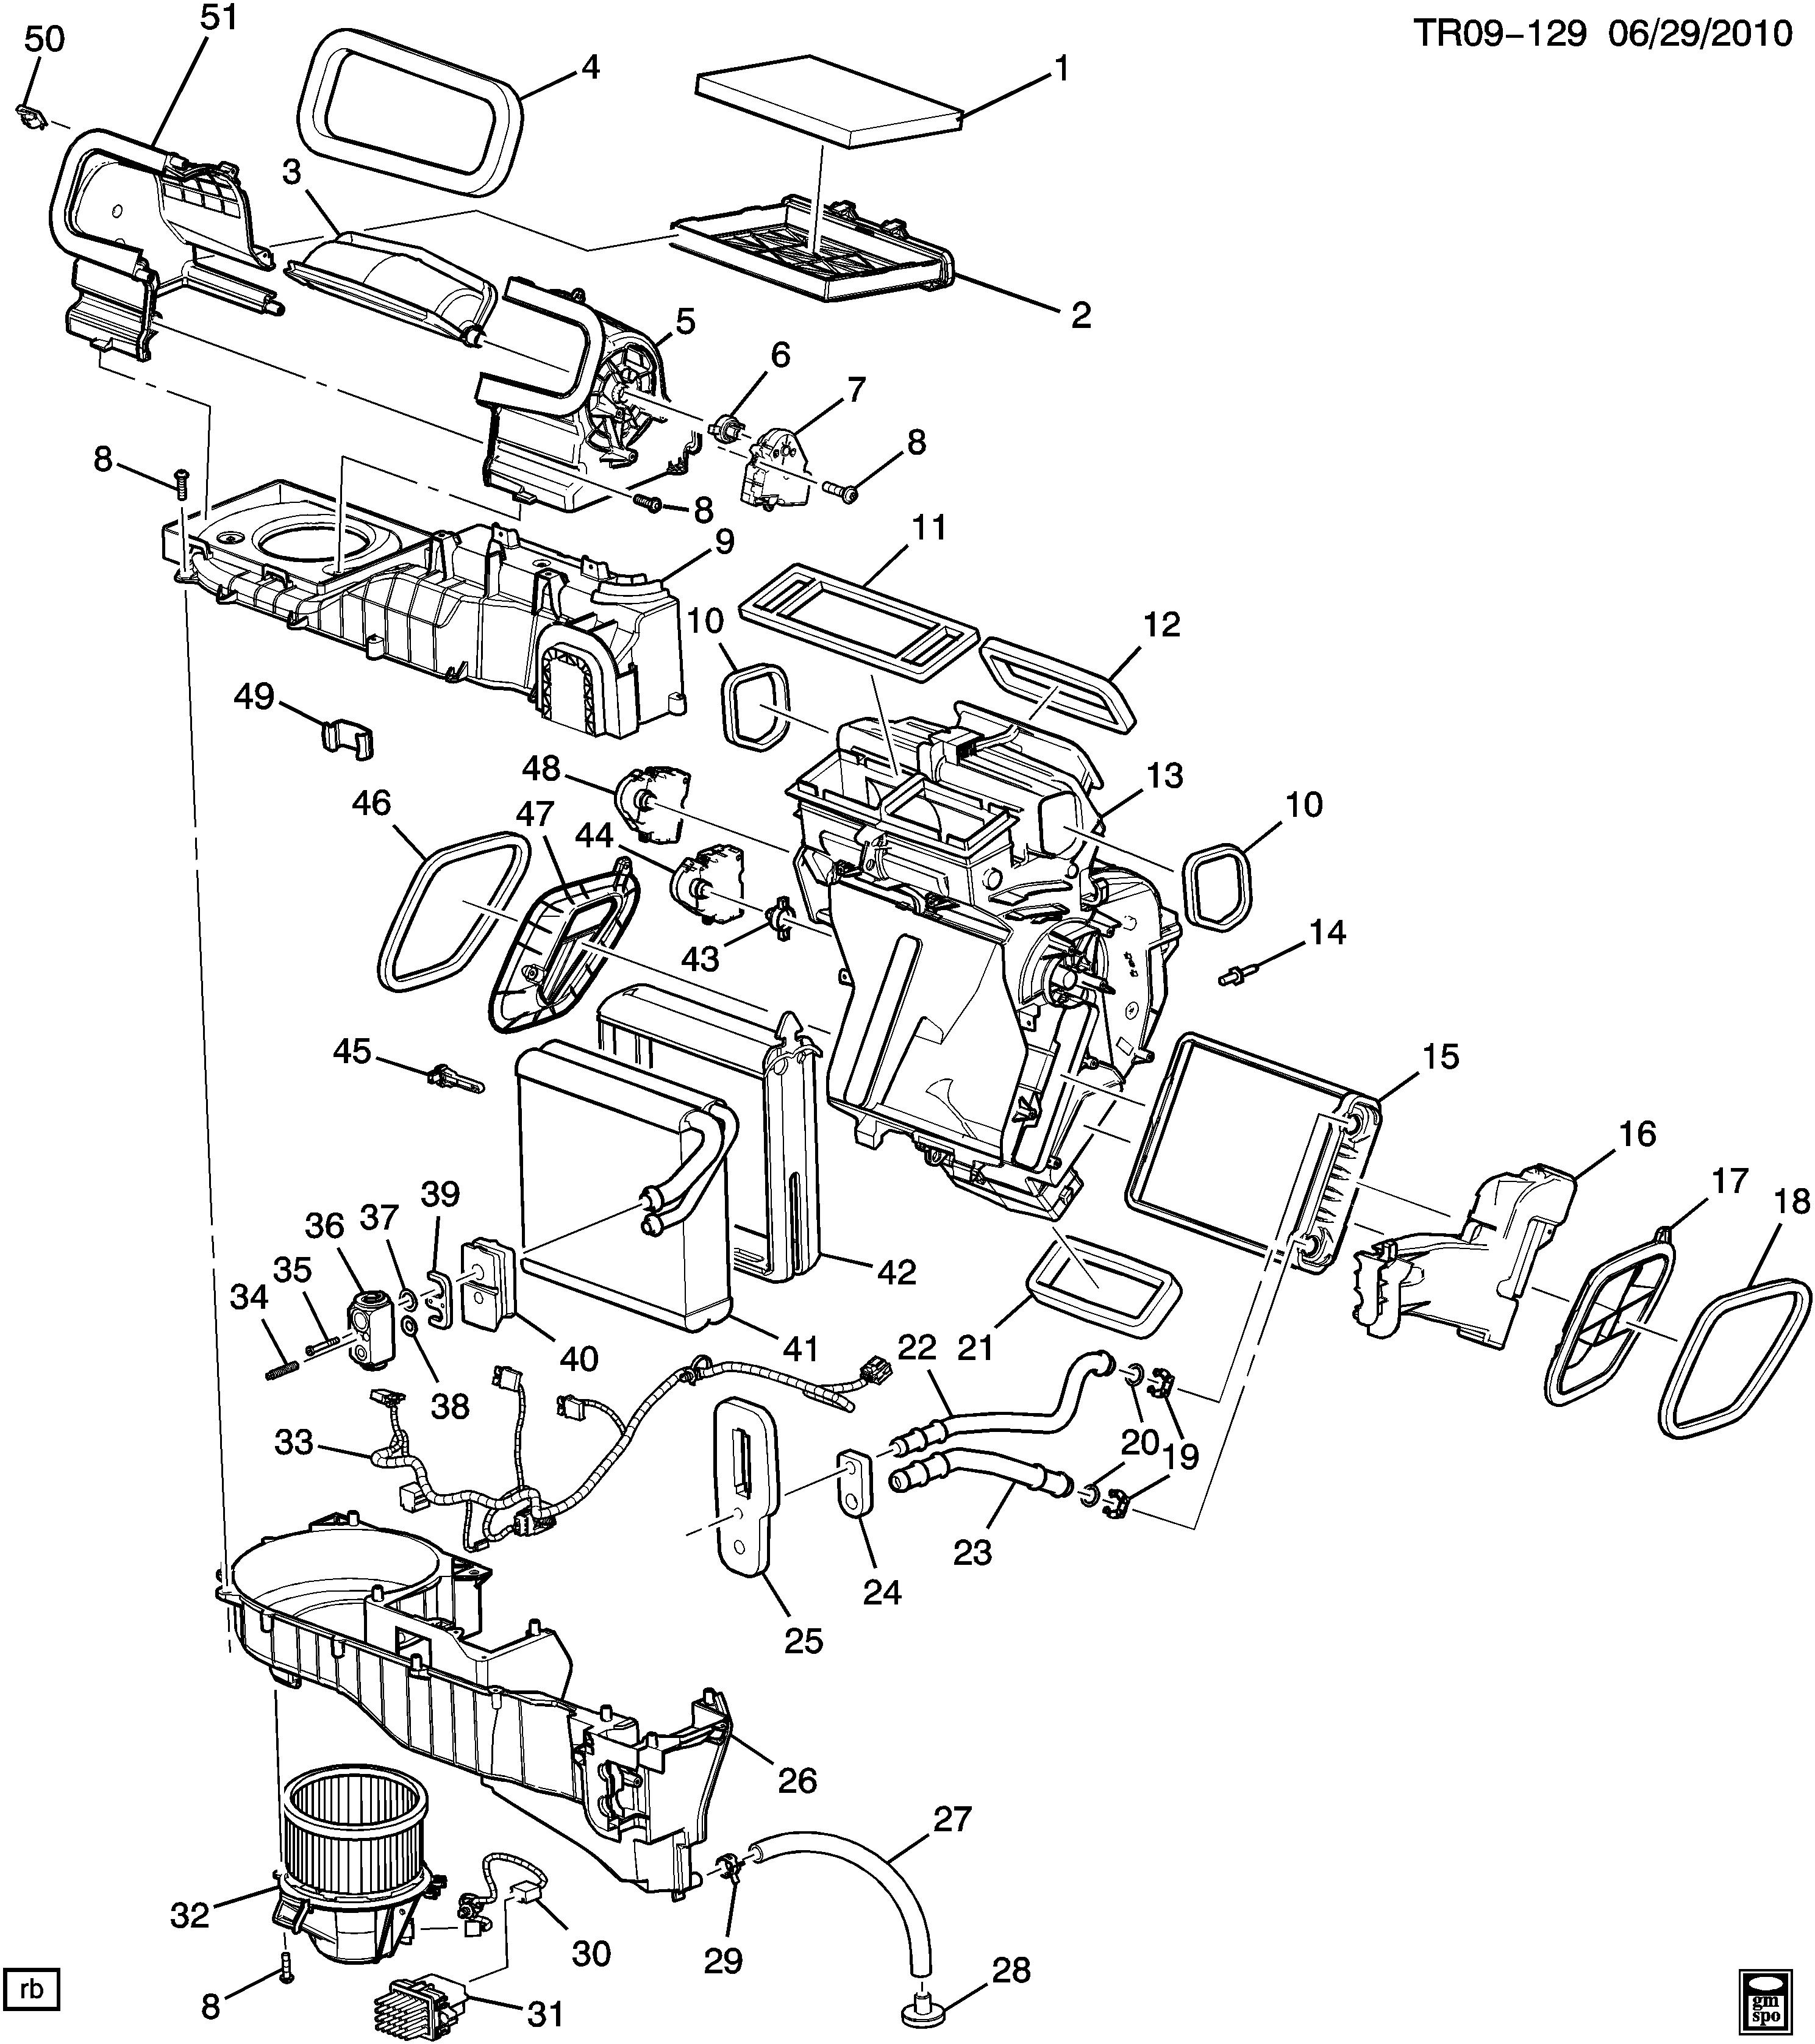 buick enclave (awd) rv1 a c \u0026 heater module asm (manualrv1 a c \u0026 heater module asm (manual temperature control c67)\u2026